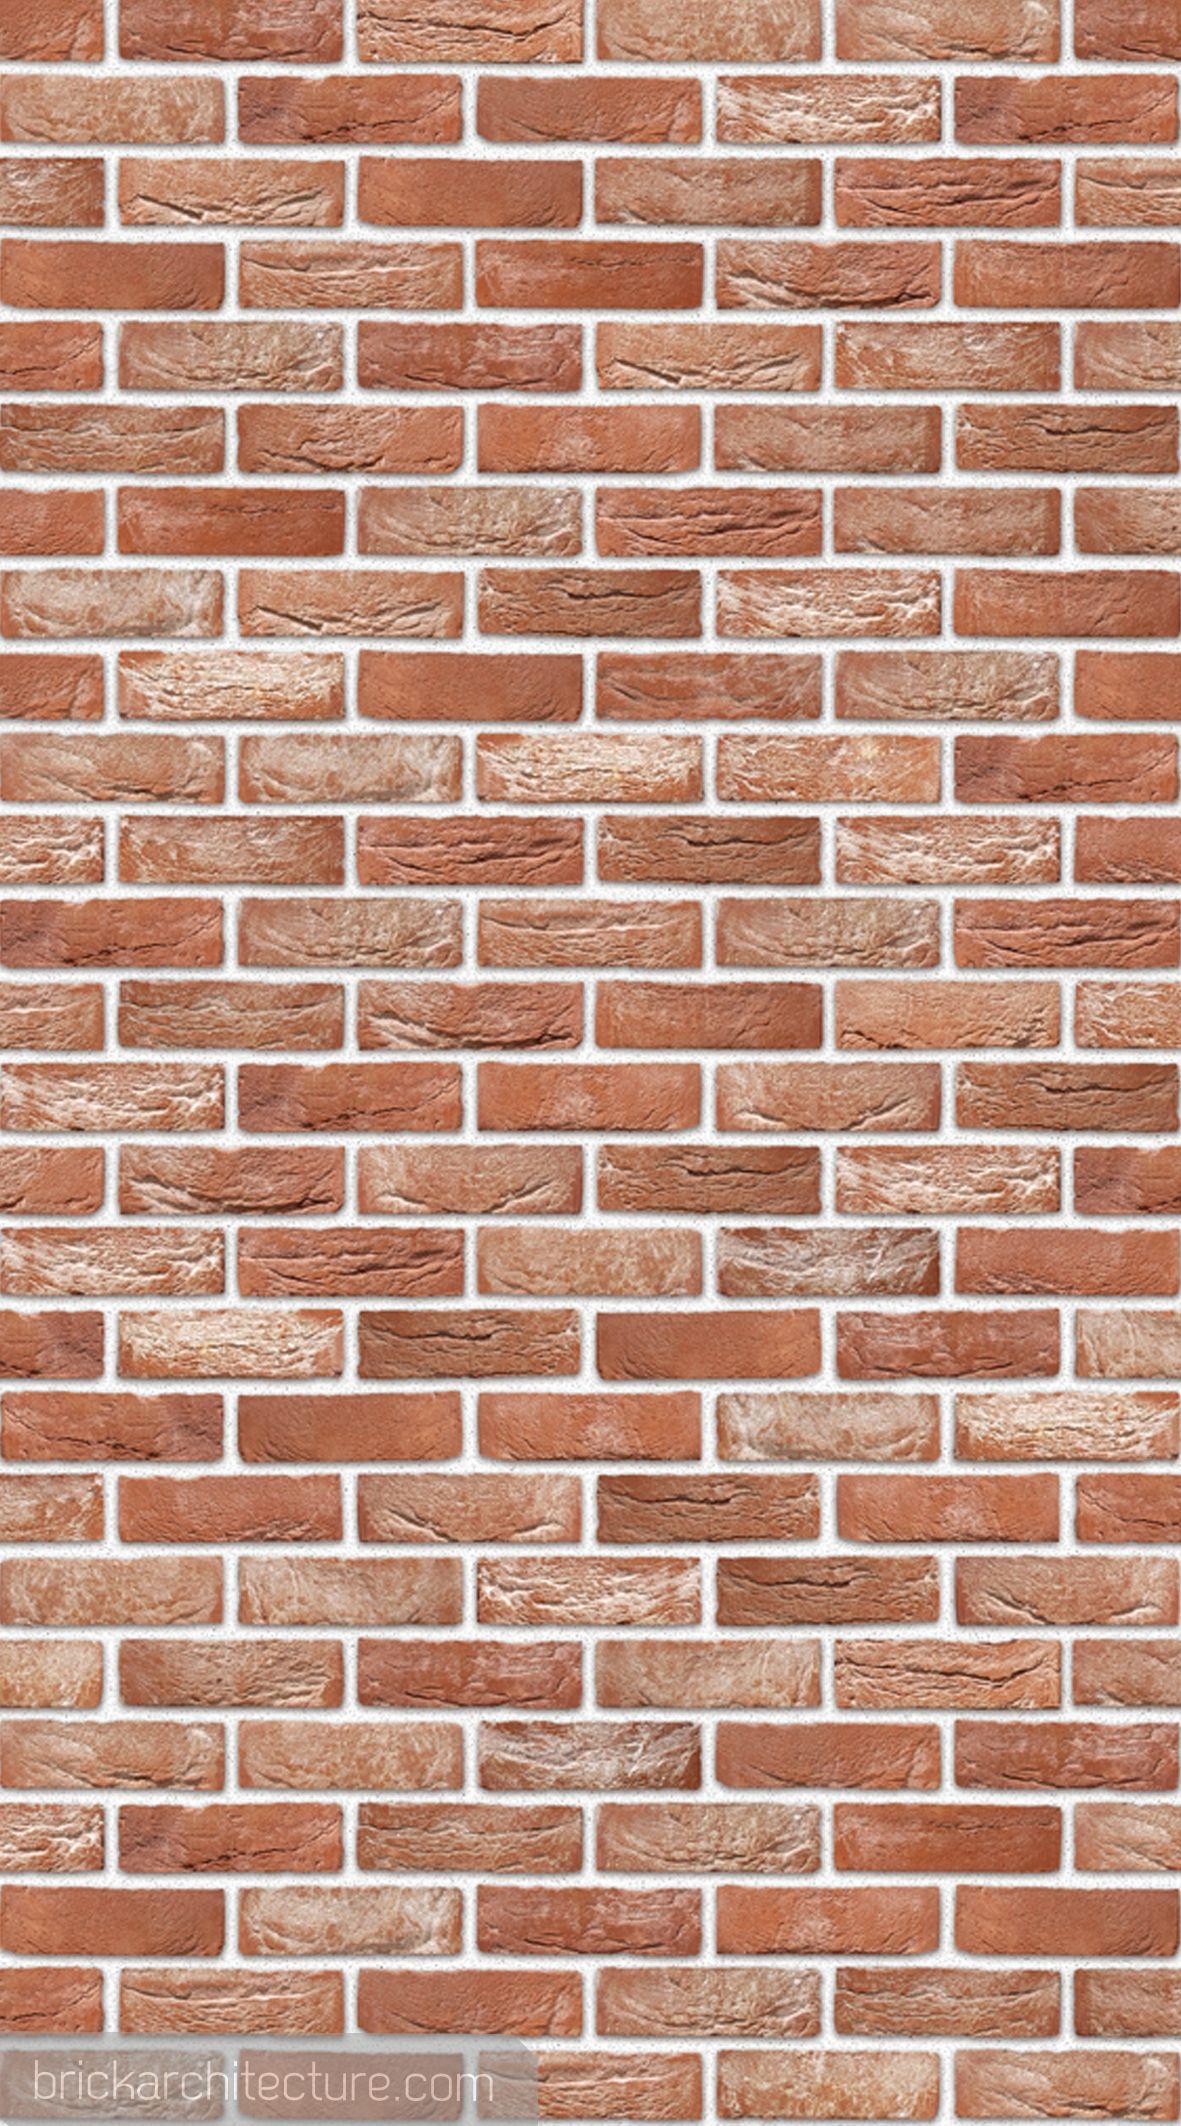 Full Page Printable Brick Pattern Brick Patterns Pattern Sketch Printable Patterns